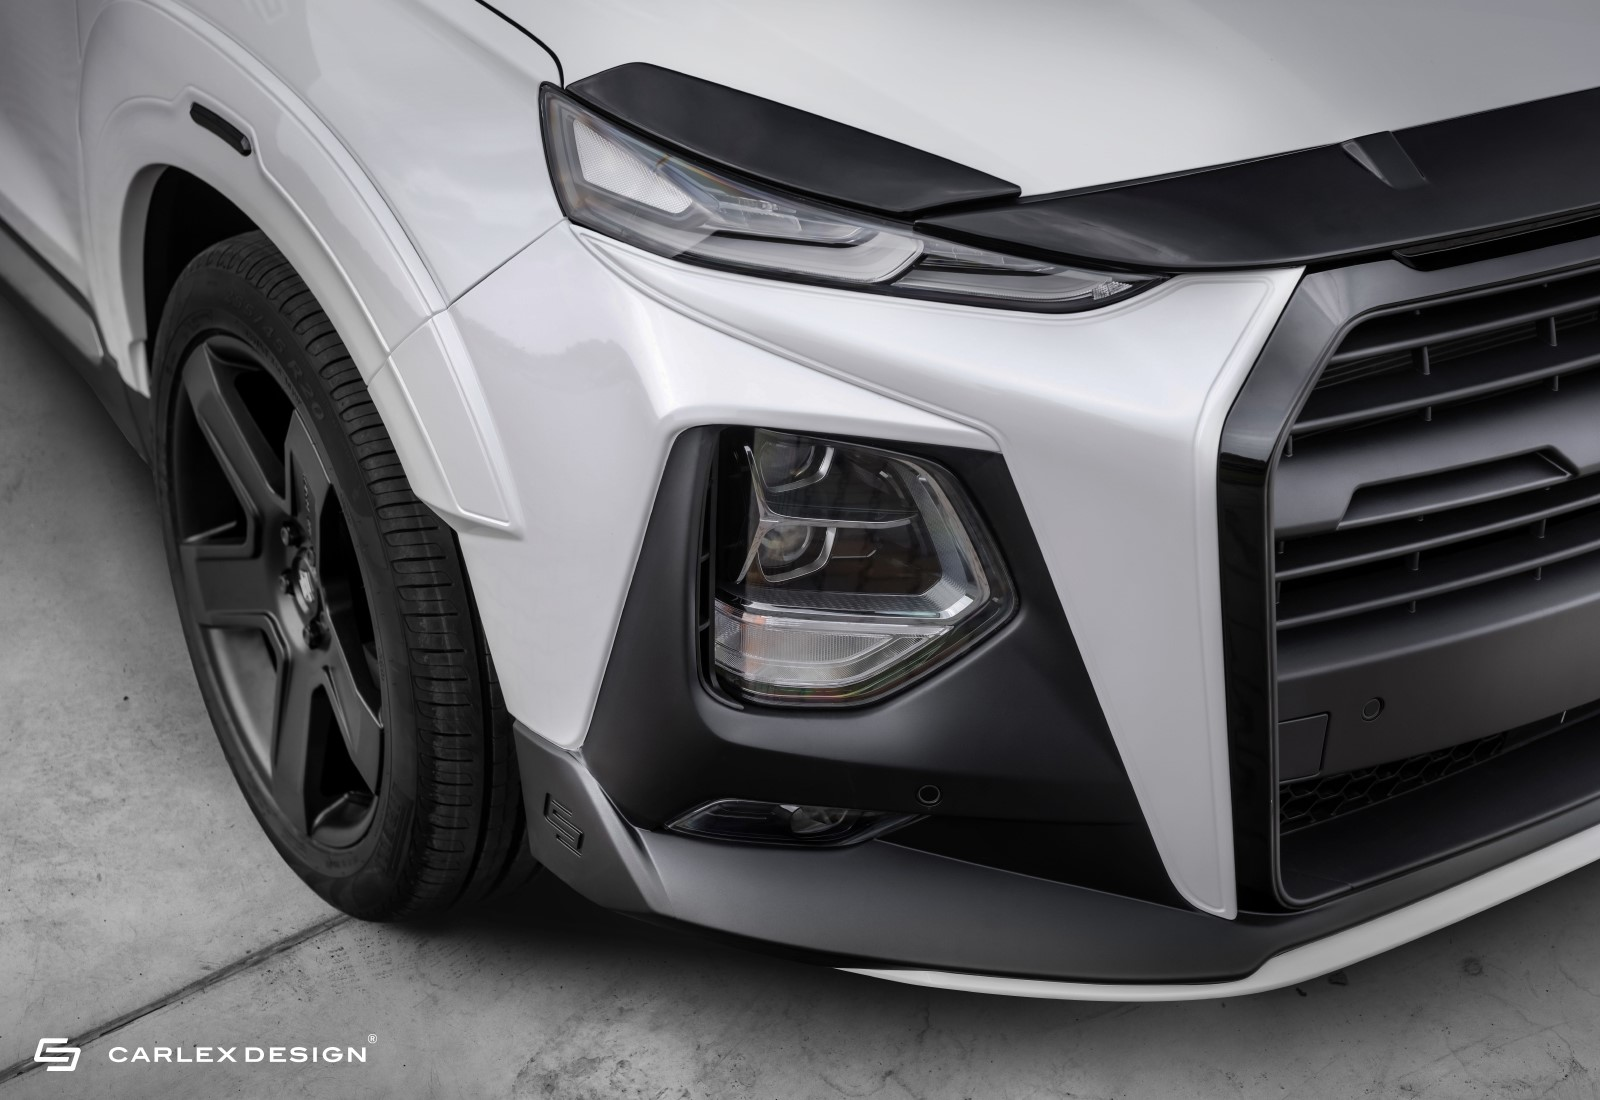 Hyundai-Santa-Fe-by-Carlex-Design-2